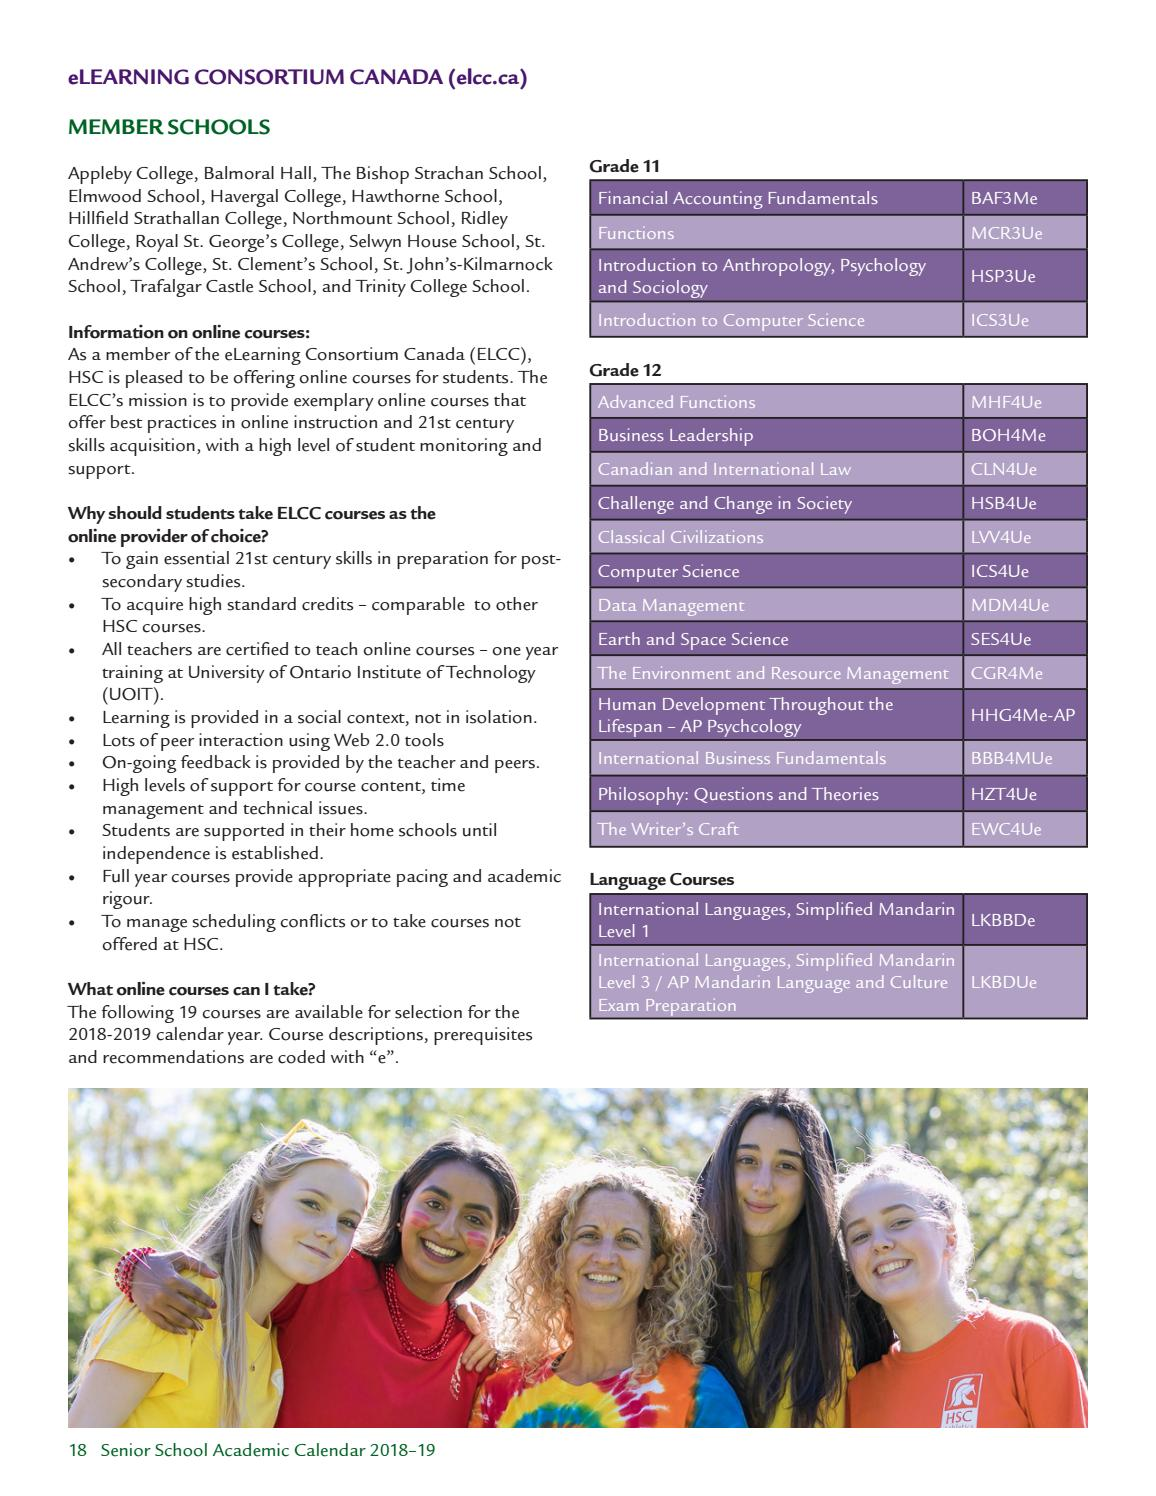 Senior School Course Calendar 2018 19 By Hillfield Strathallan